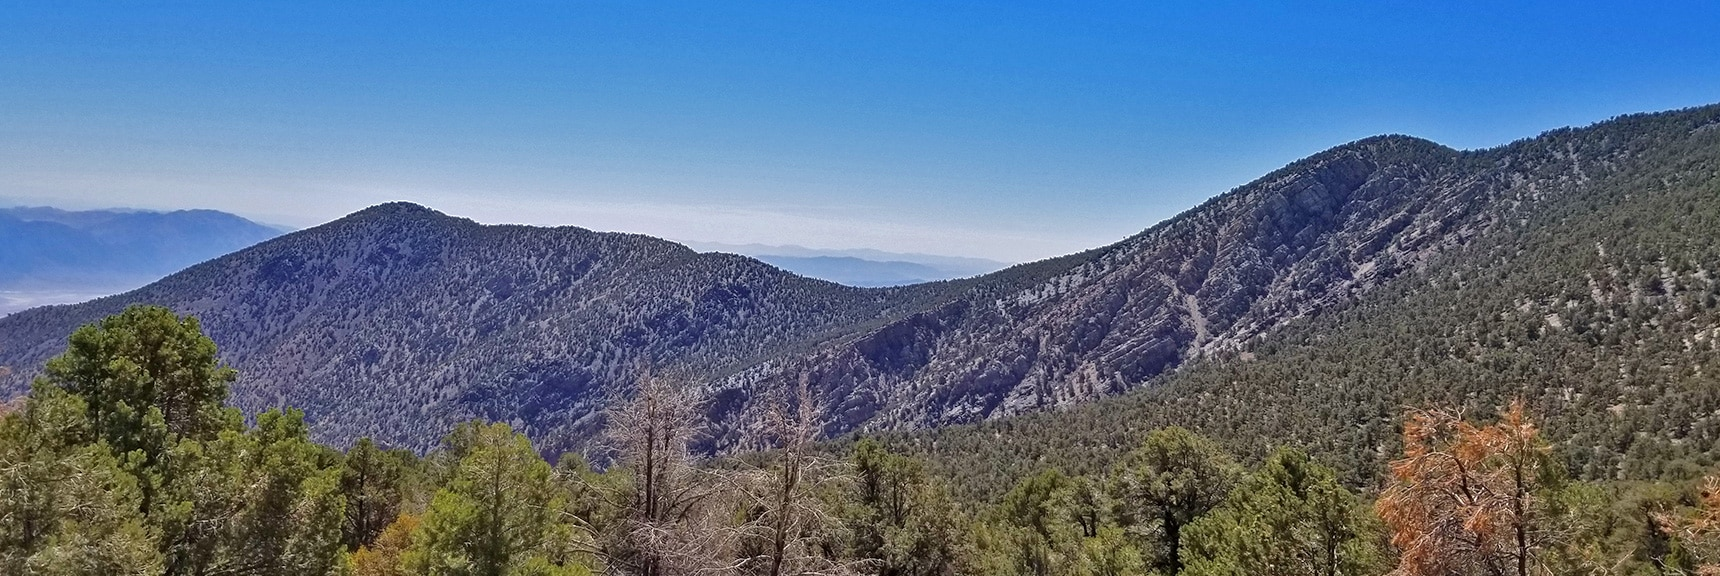 Hanaupah Canyon Upper Approach Ridge from Death Valley to Mahogany Flat Area   Wildrose Peak   Panamint Mountain Range   Death Valley National Park, California